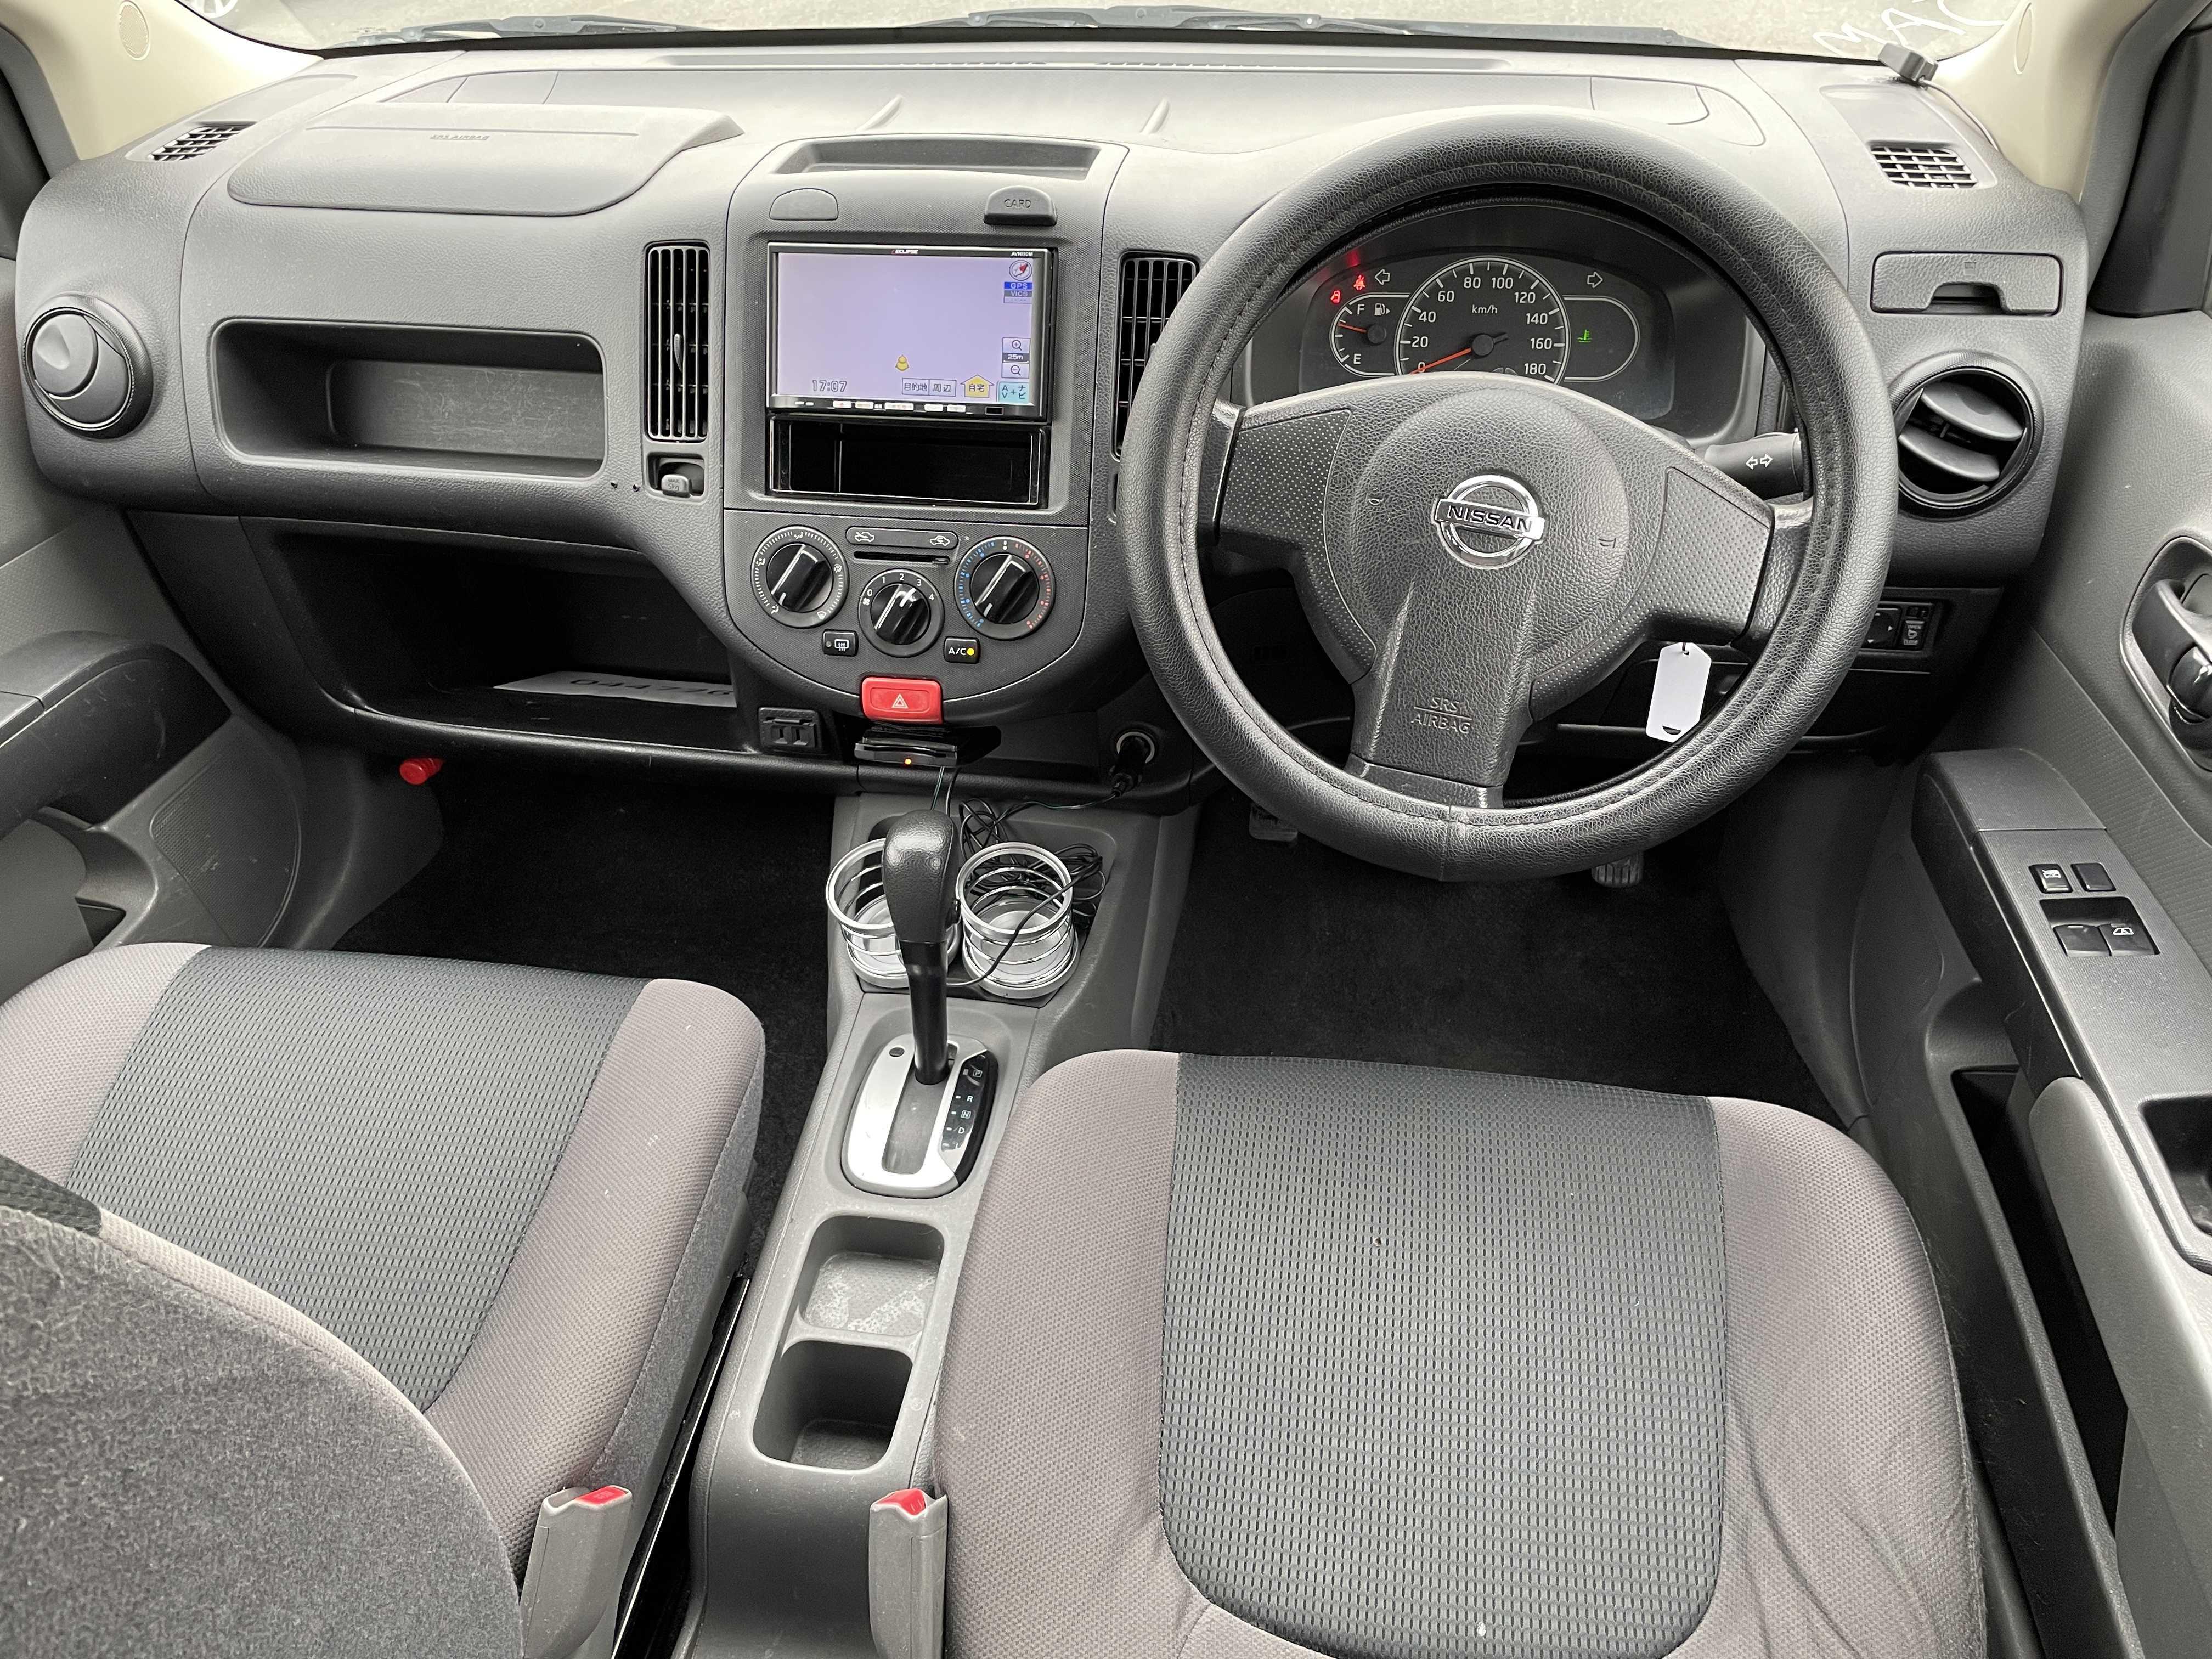 Nissan Ad Van 2015, SILVER, 1500cc - Autocraft Japan